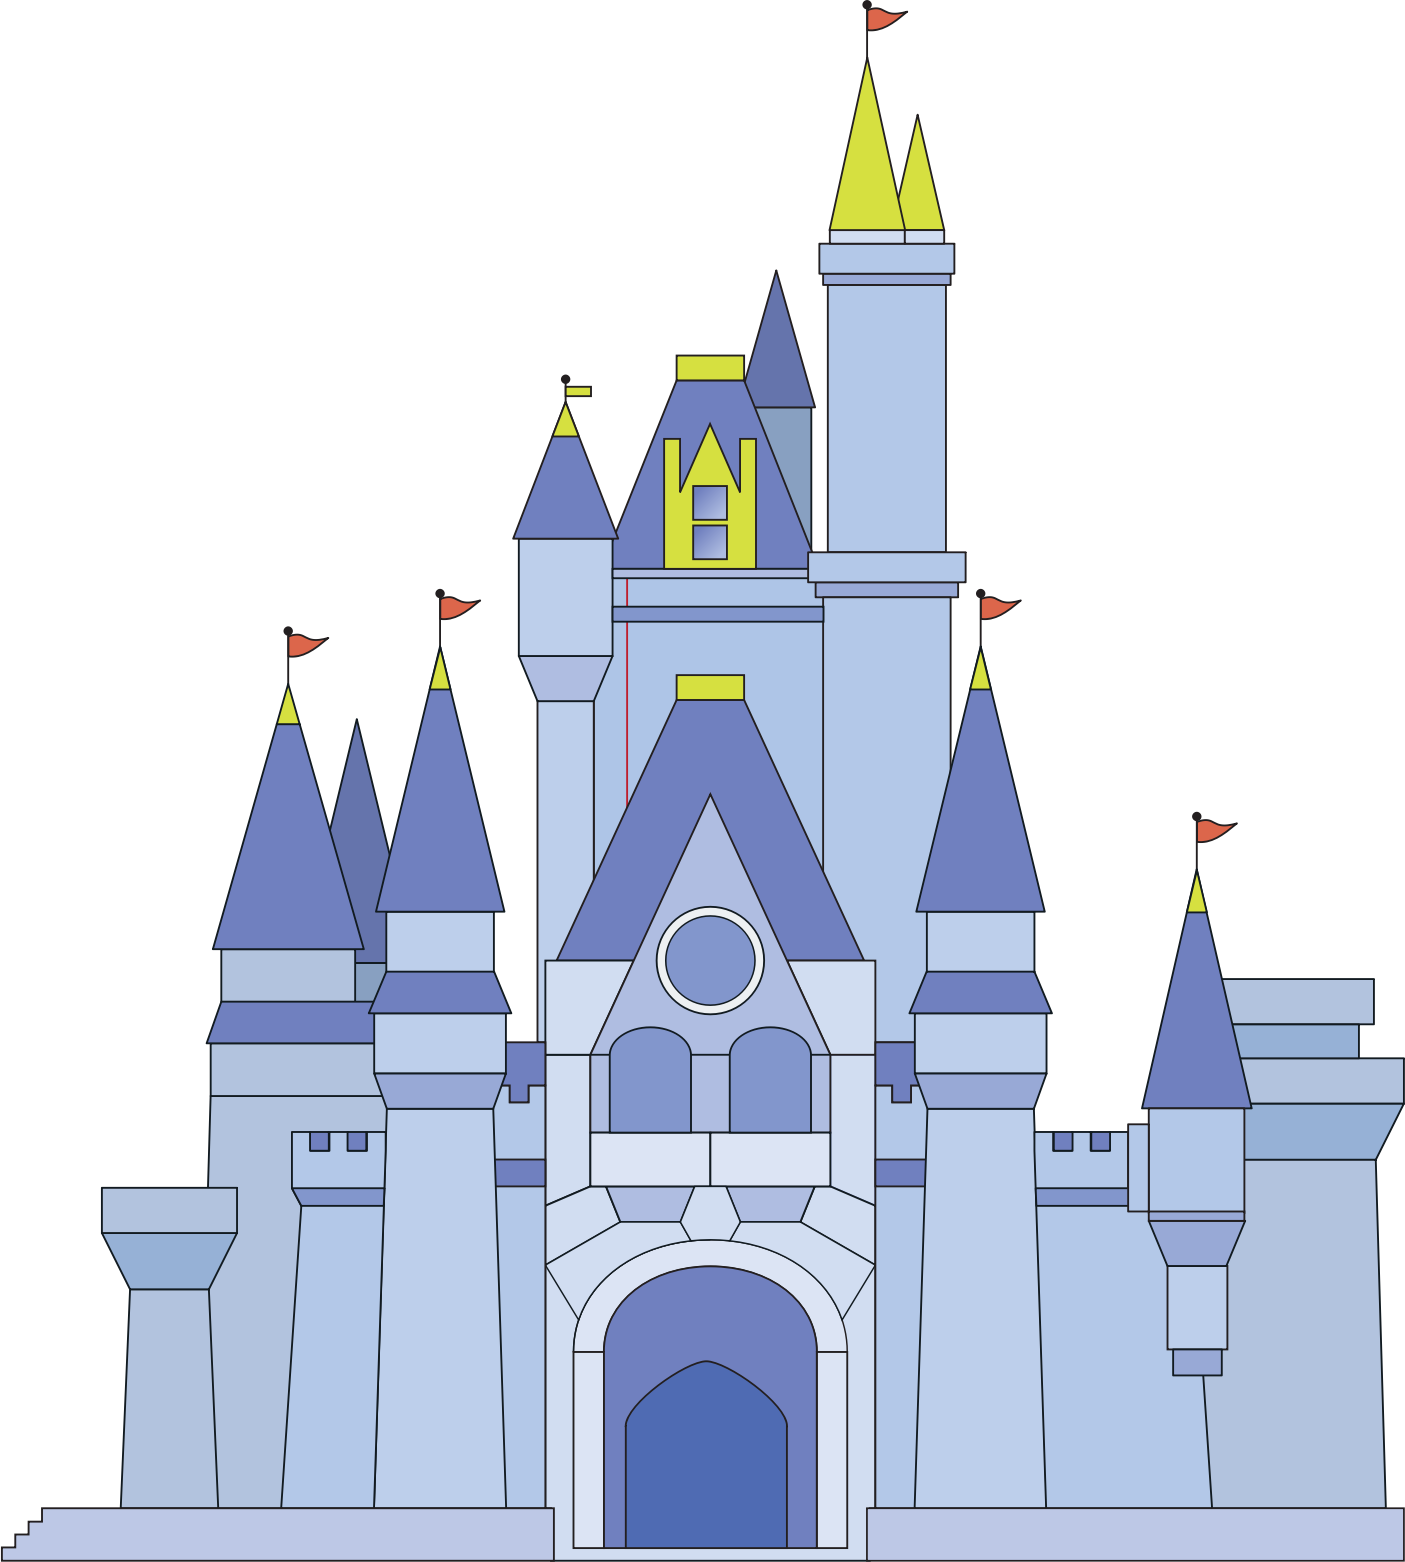 Clipart castle disney. Magic kingdom sleeping beauty